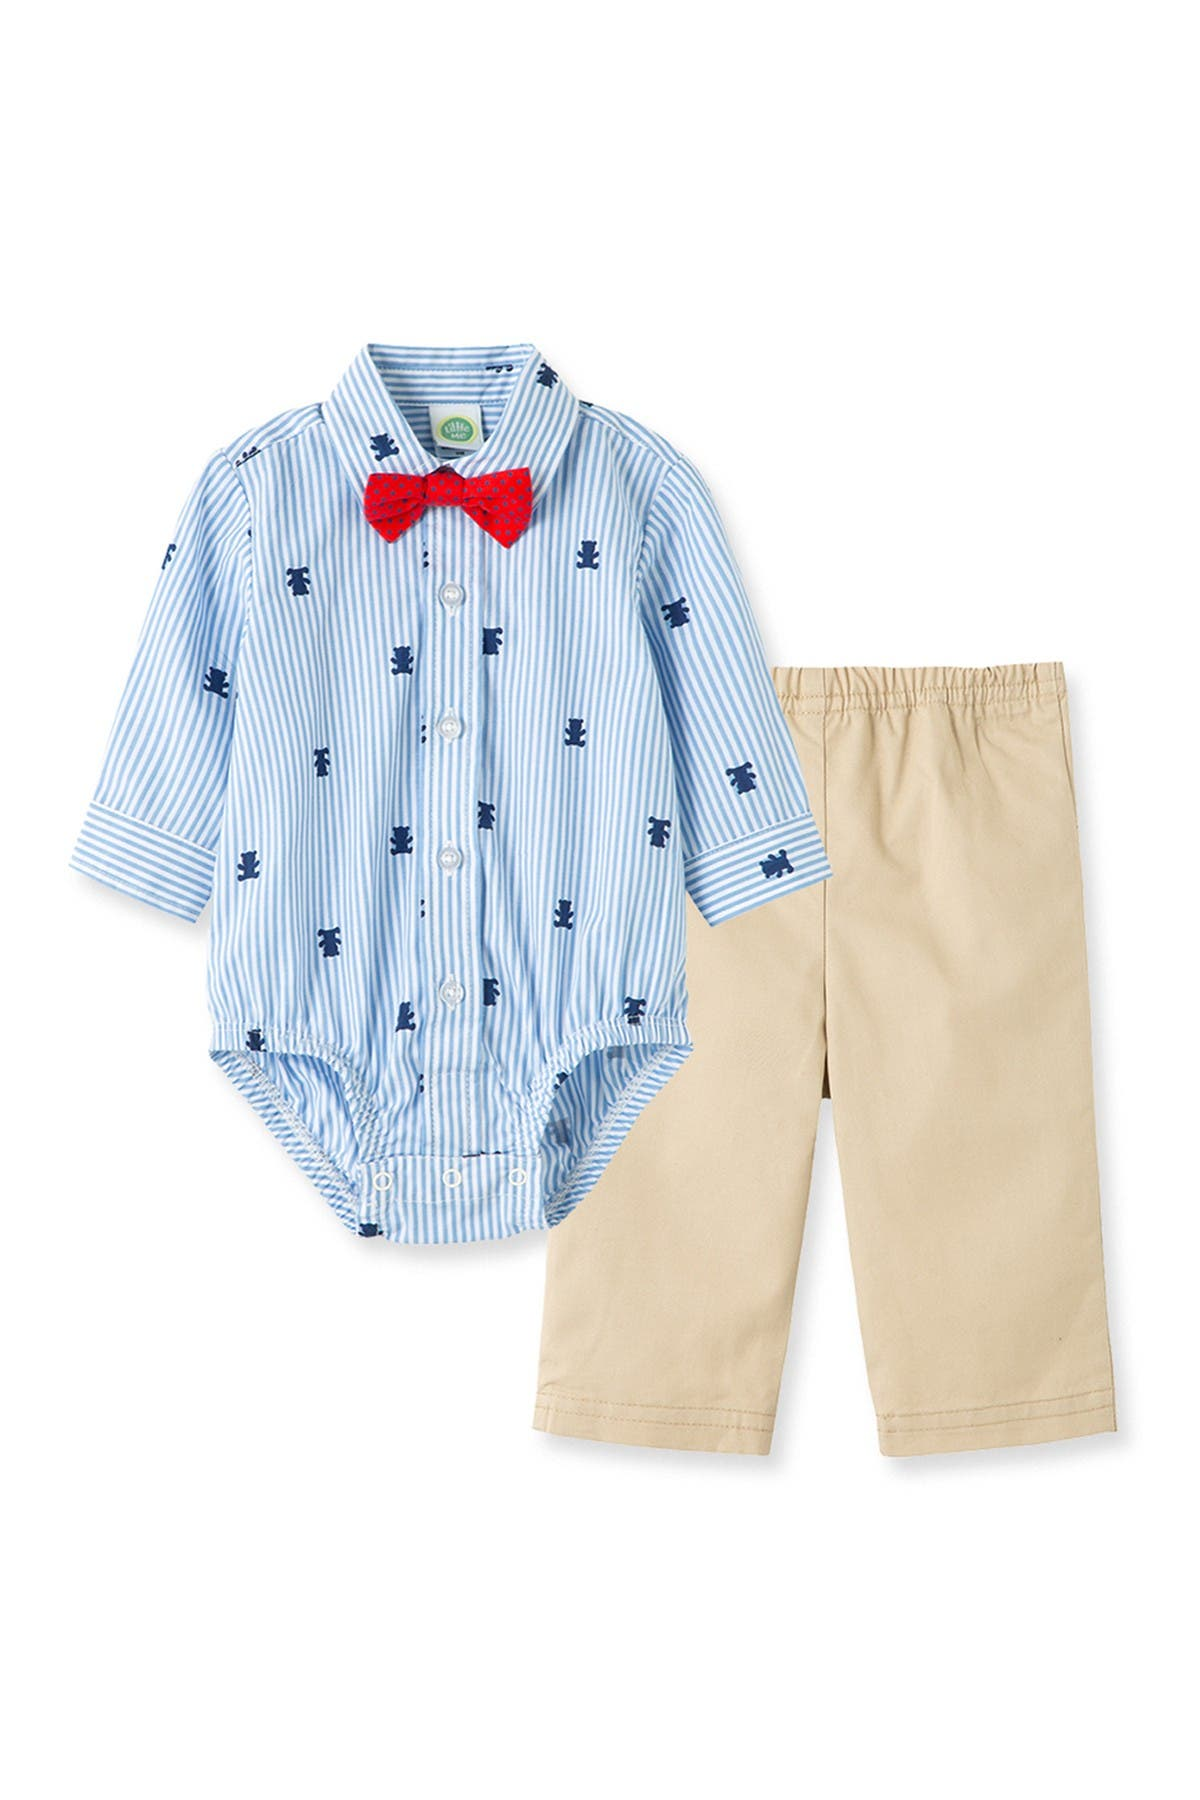 Image of Little Me Bear Print Bodysuit & Pants Set